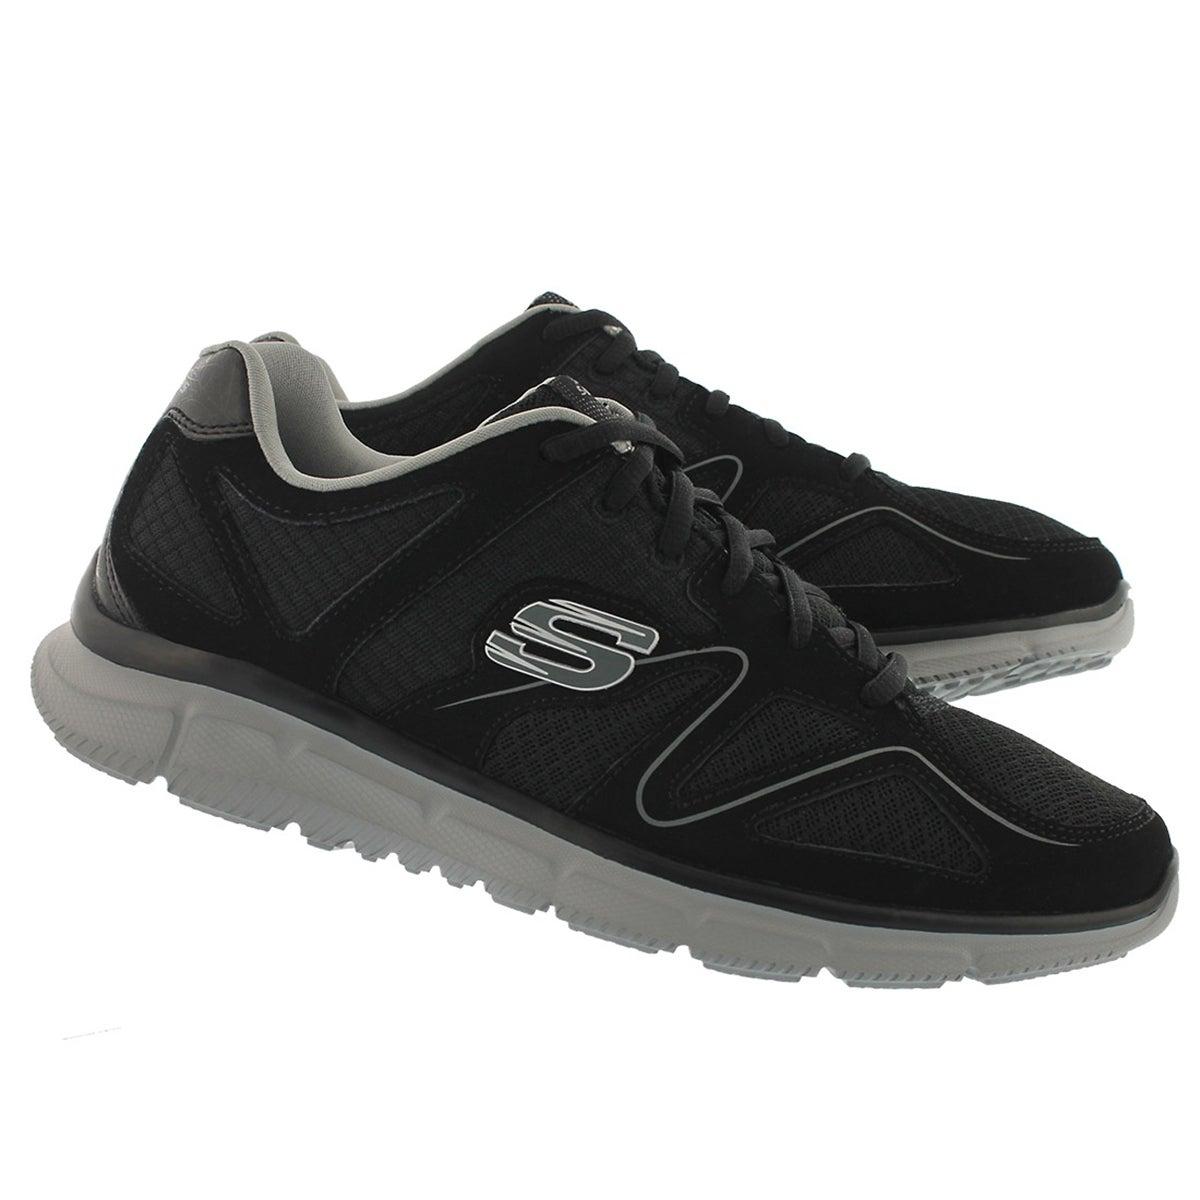 Mns VerseFlashPoint blk/gry running shoe